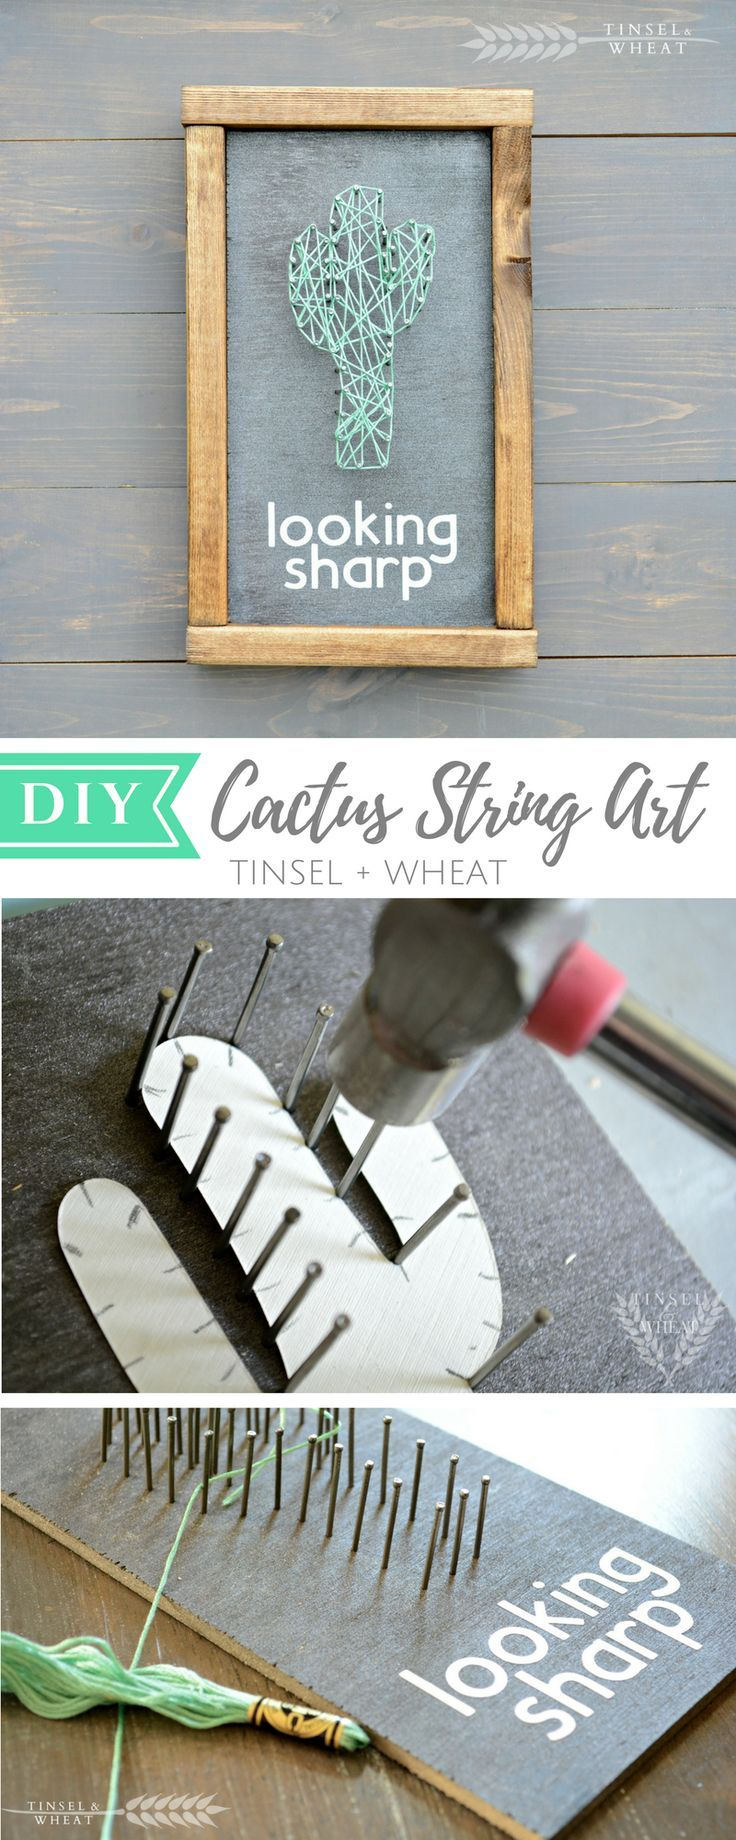 Diy cactus string art tutorial diy pinterest string art diy cactus string art tutorial baditri Image collections